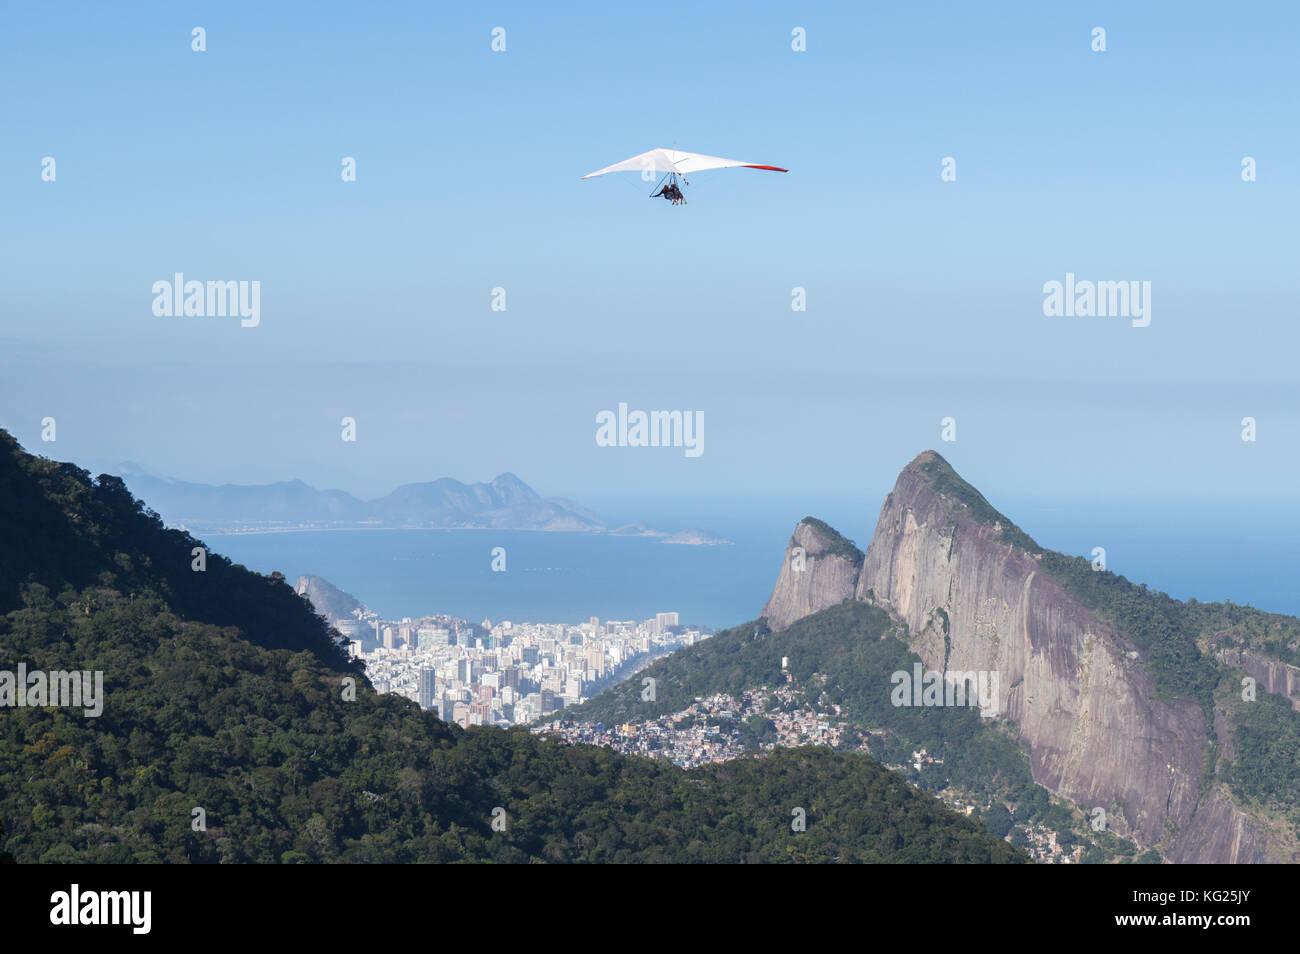 Drachenfliegen in Rio de Janeiro, Brasilien, Südamerika Stockbild